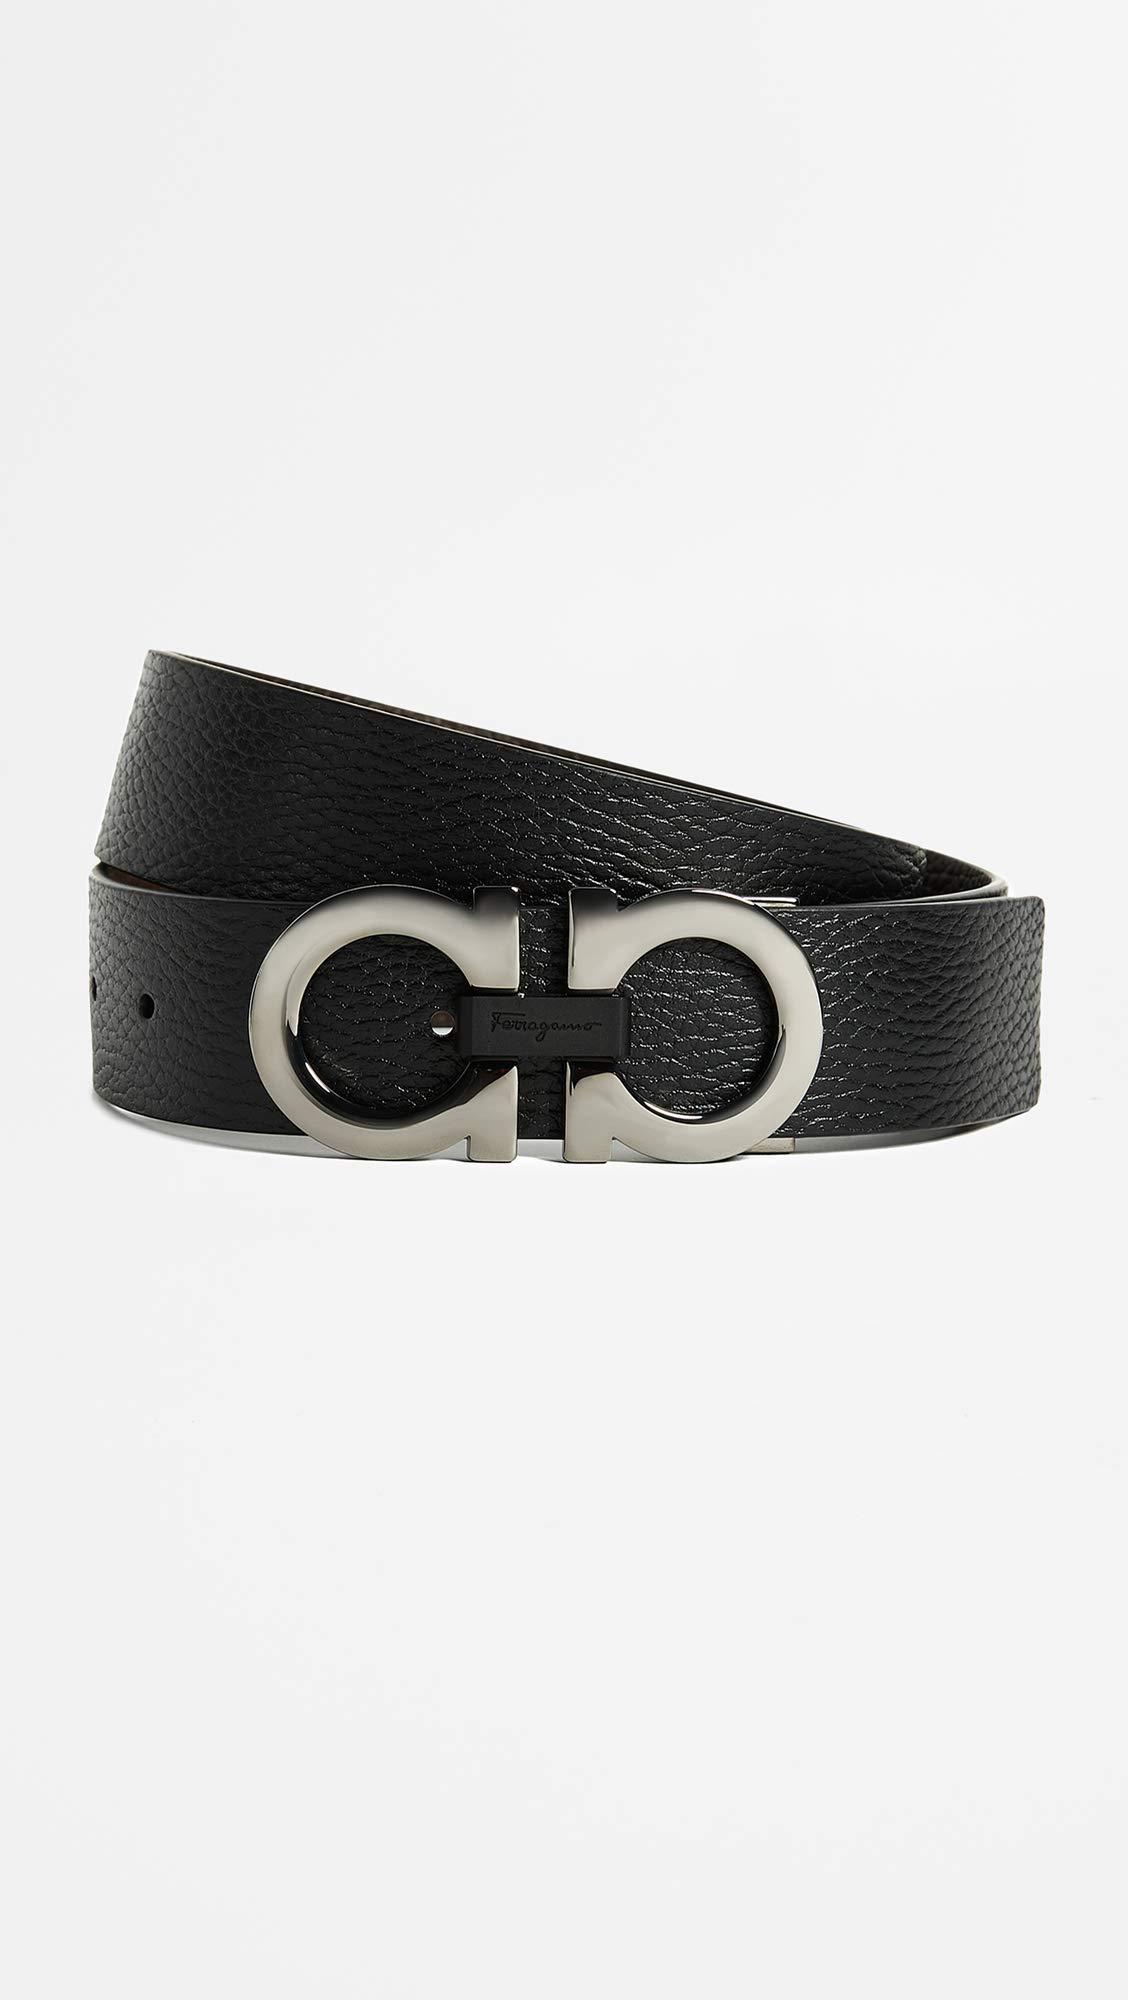 Salvatore Ferragamo Men's Reversible/Adjustable Belt-678783, Nero/Hickory 36 by Salvatore Ferragamo (Image #2)